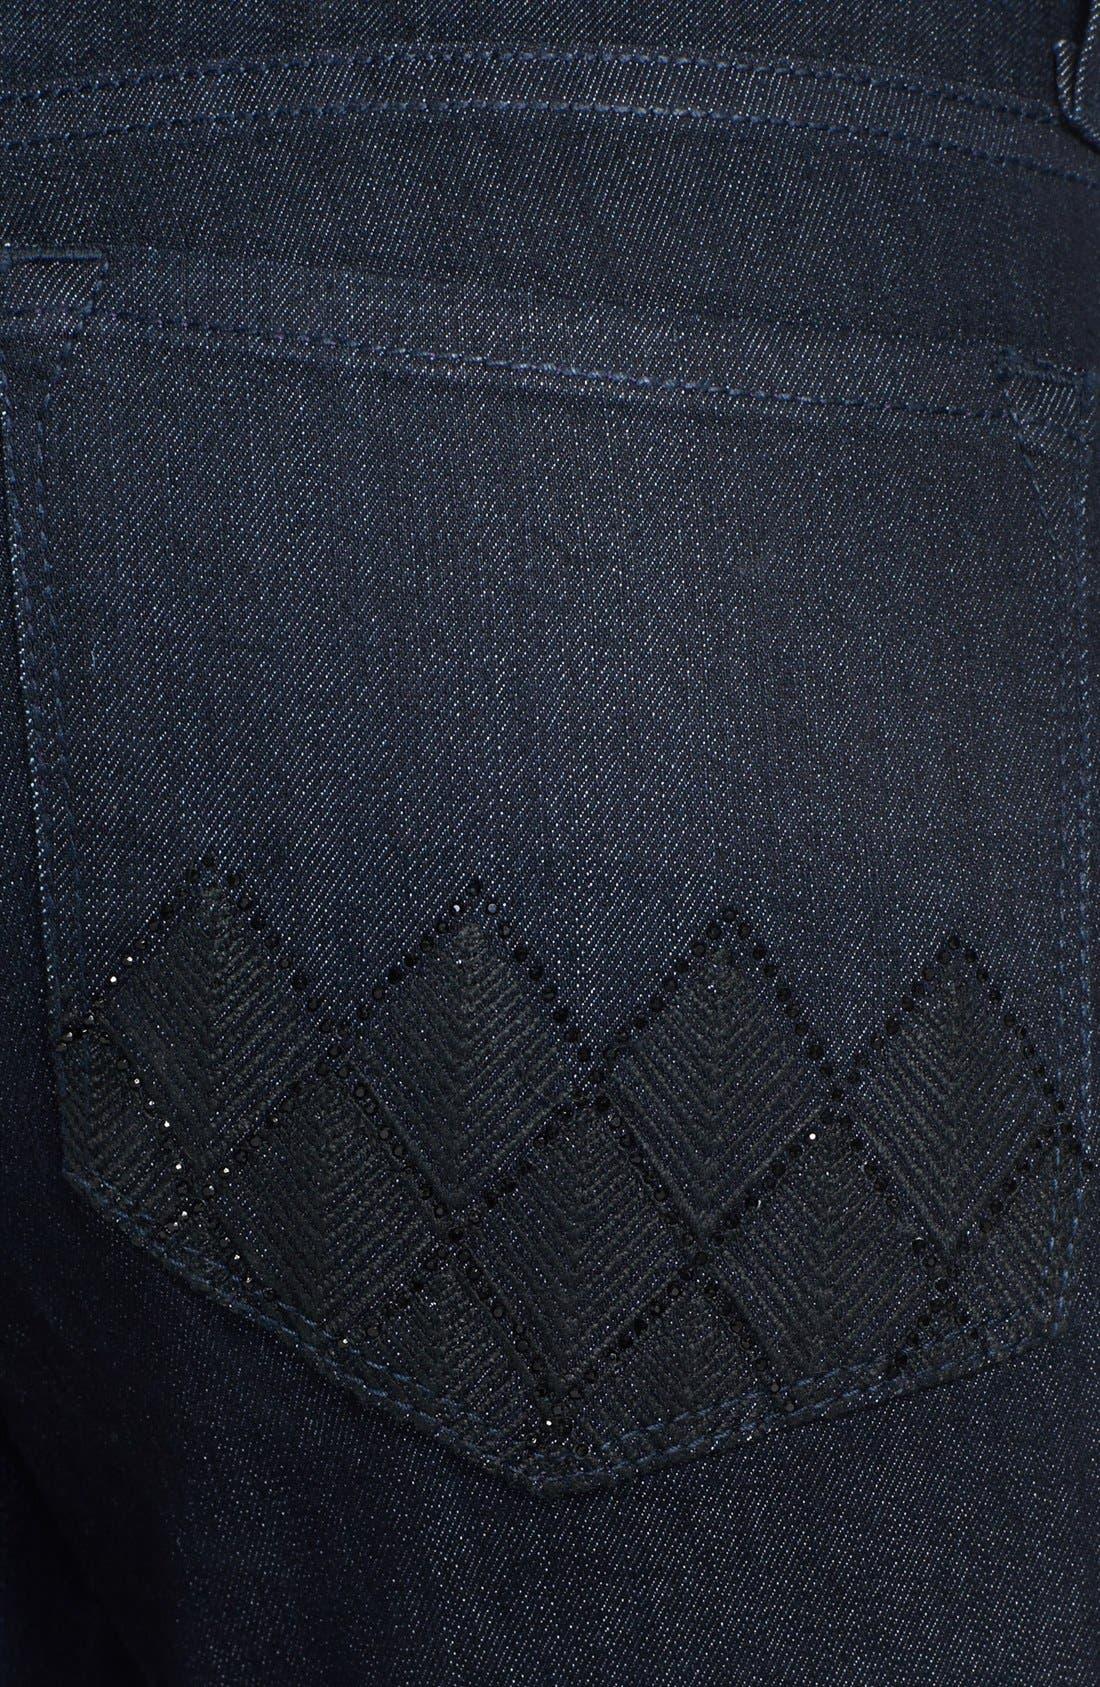 Alternate Image 2  - NYDJ 'Marilyn' Embellished Pocket Stretch Straight Leg Jeans